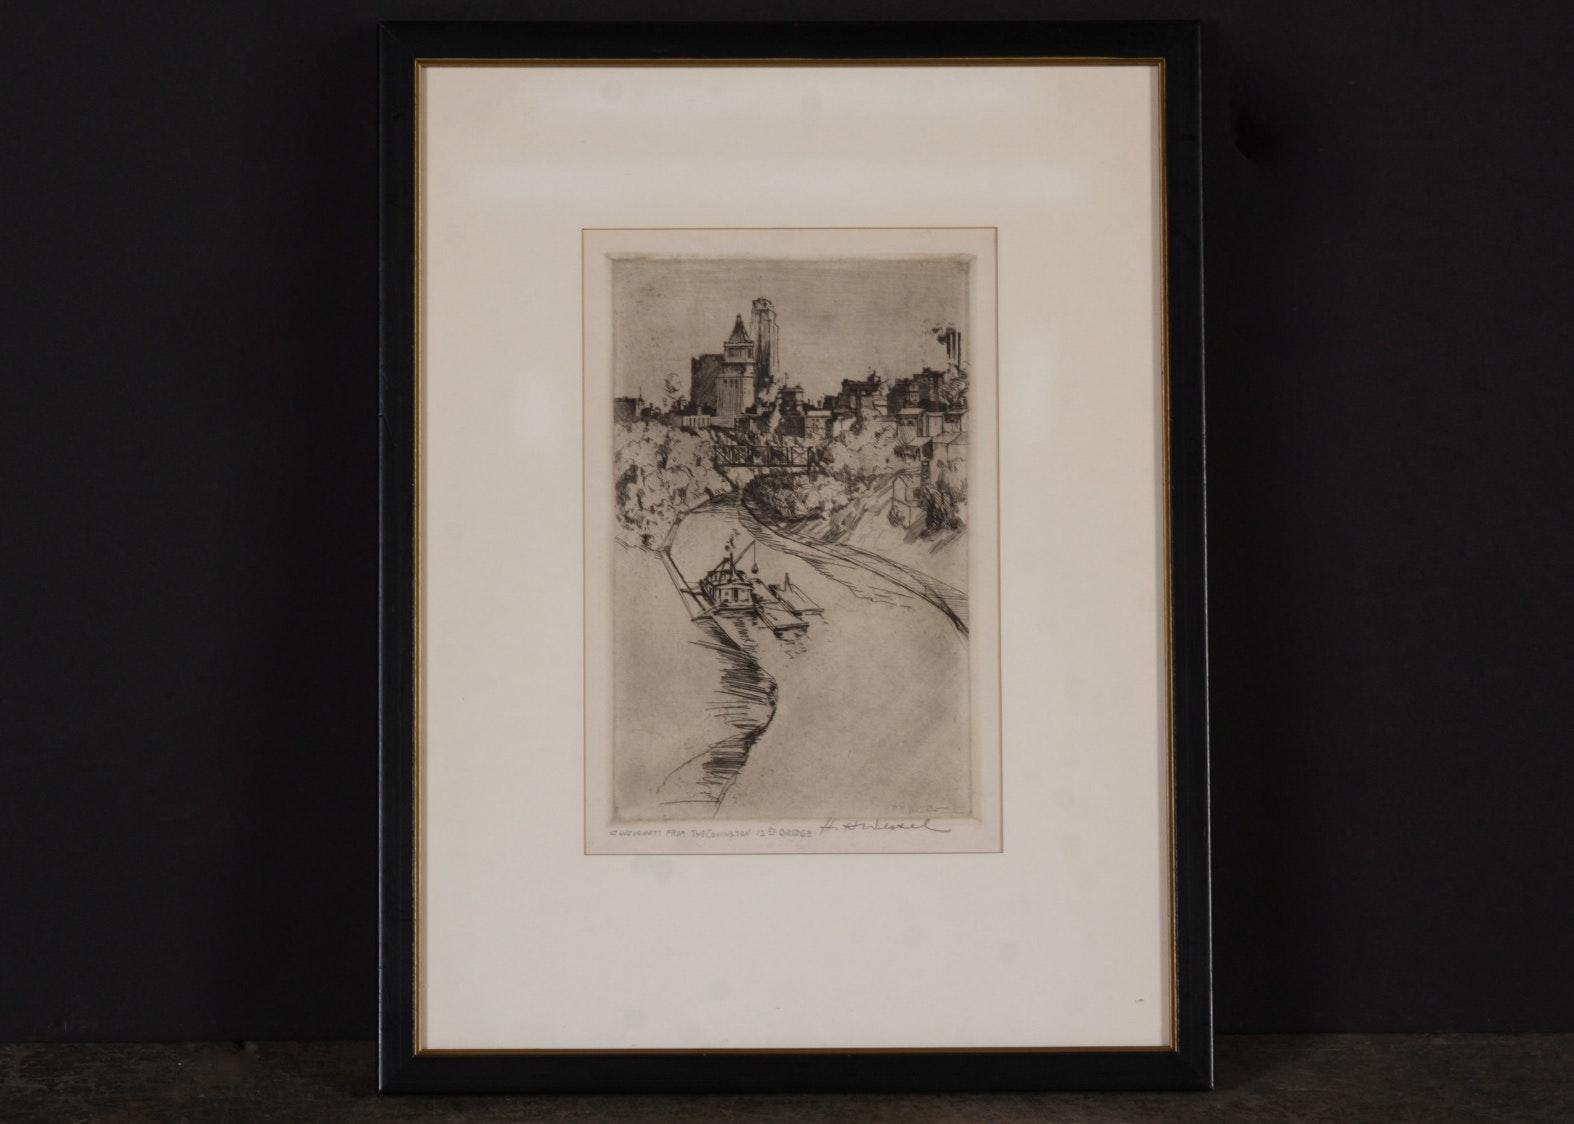 Original H.H. Wessel Etching